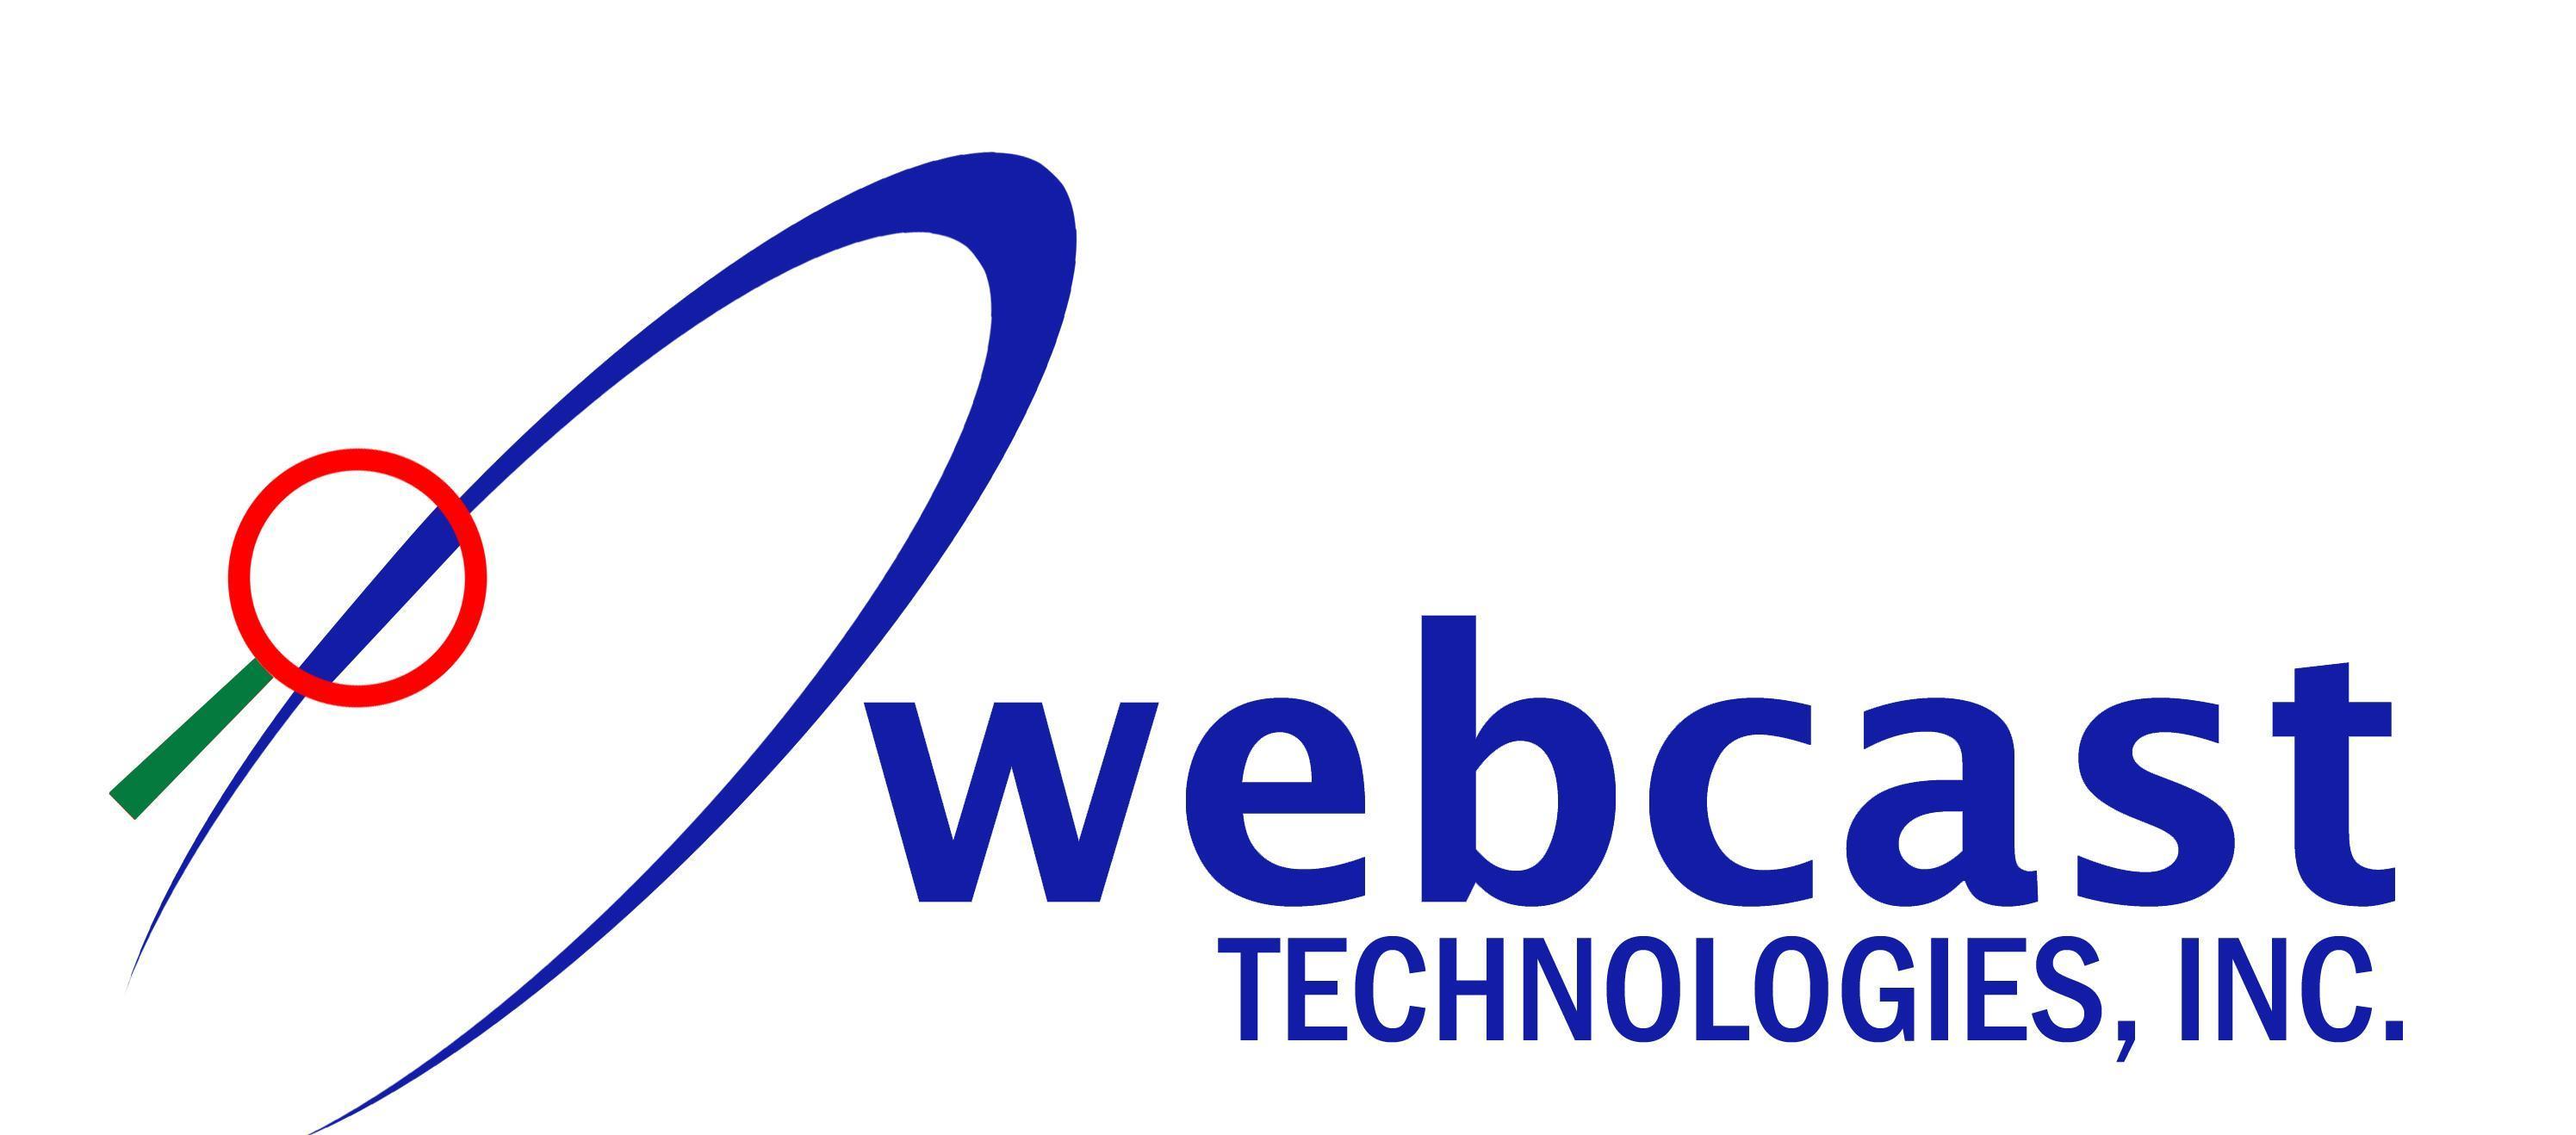 Webcast Technologies, Inc.